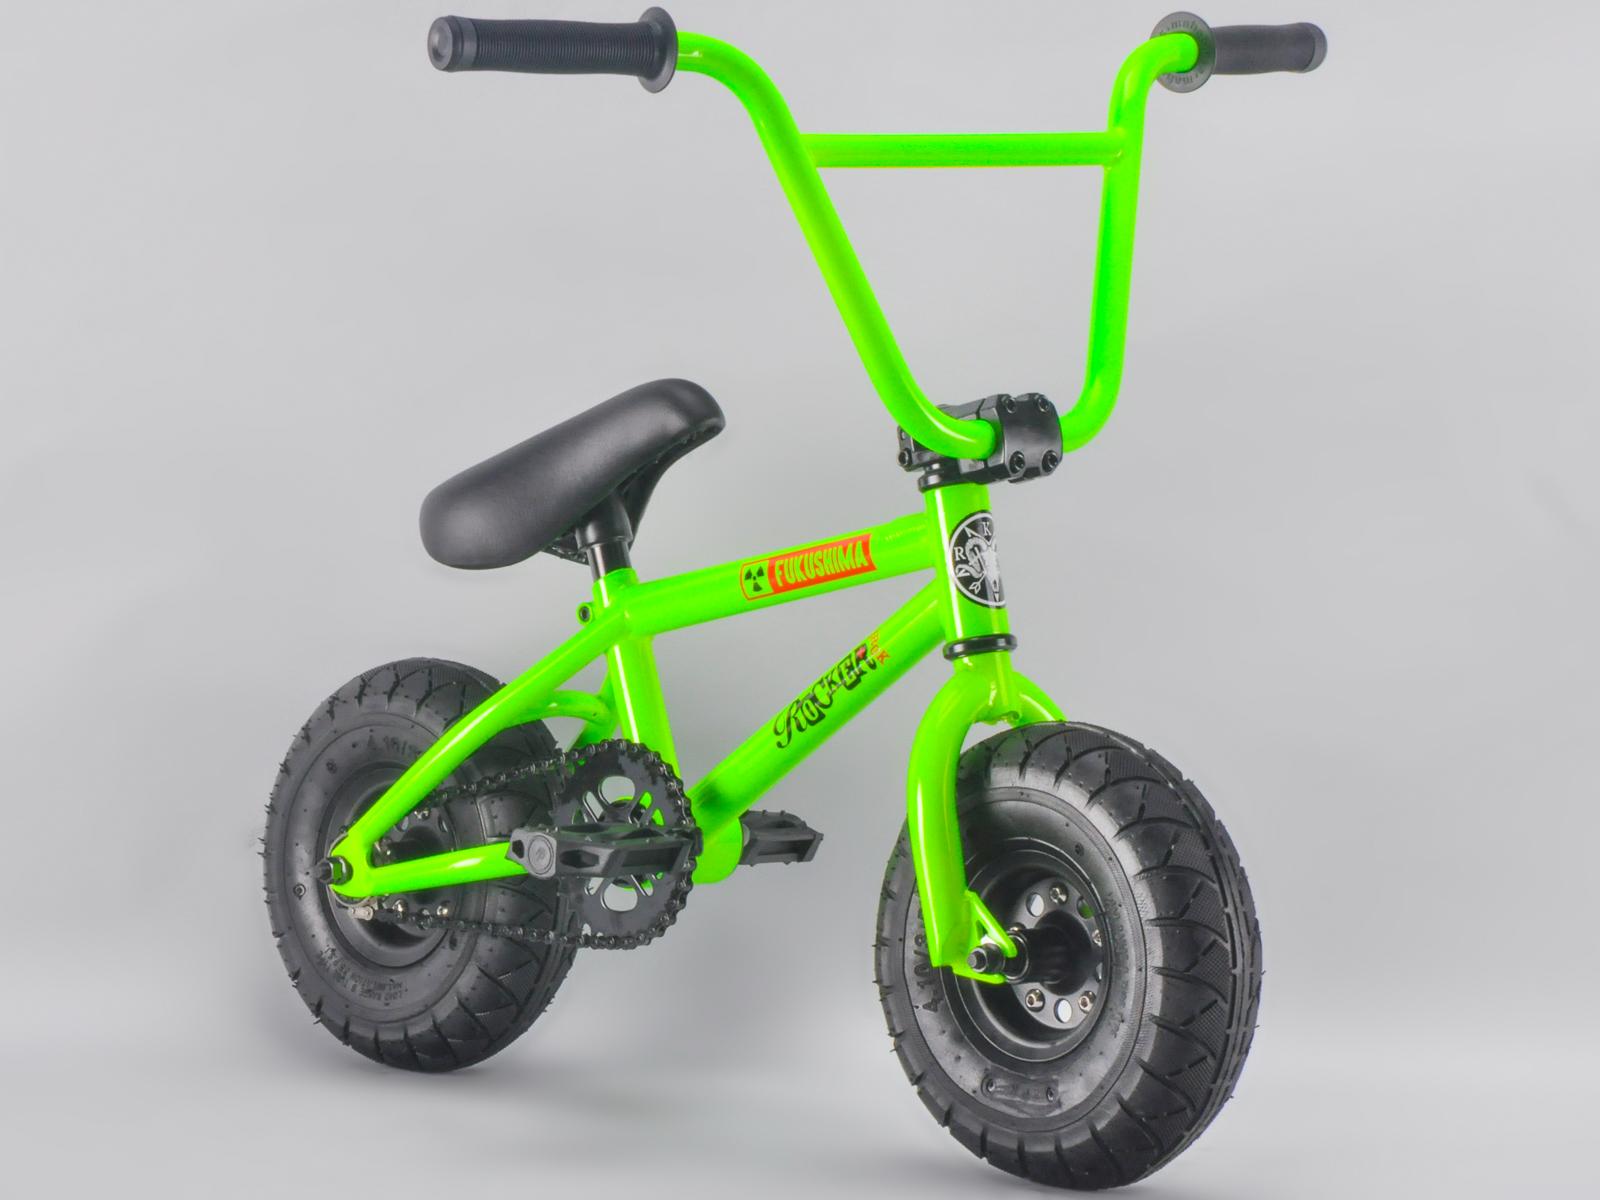 rocker bmx mini bmx bike fukushima irok rkr glow in the. Black Bedroom Furniture Sets. Home Design Ideas